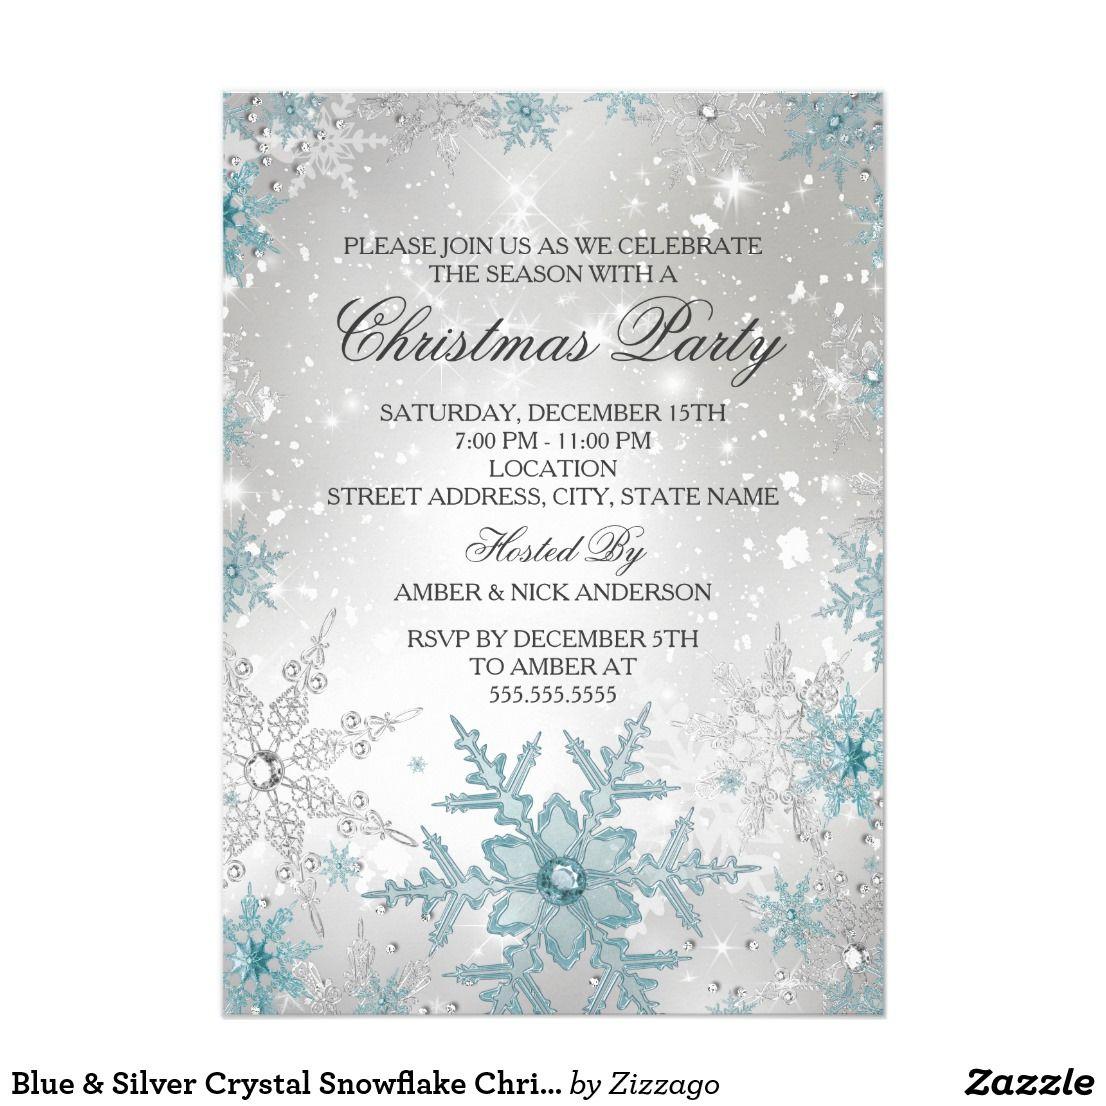 Blue & Silver Crystal Snowflake Christmas Party Card | Christmas ...